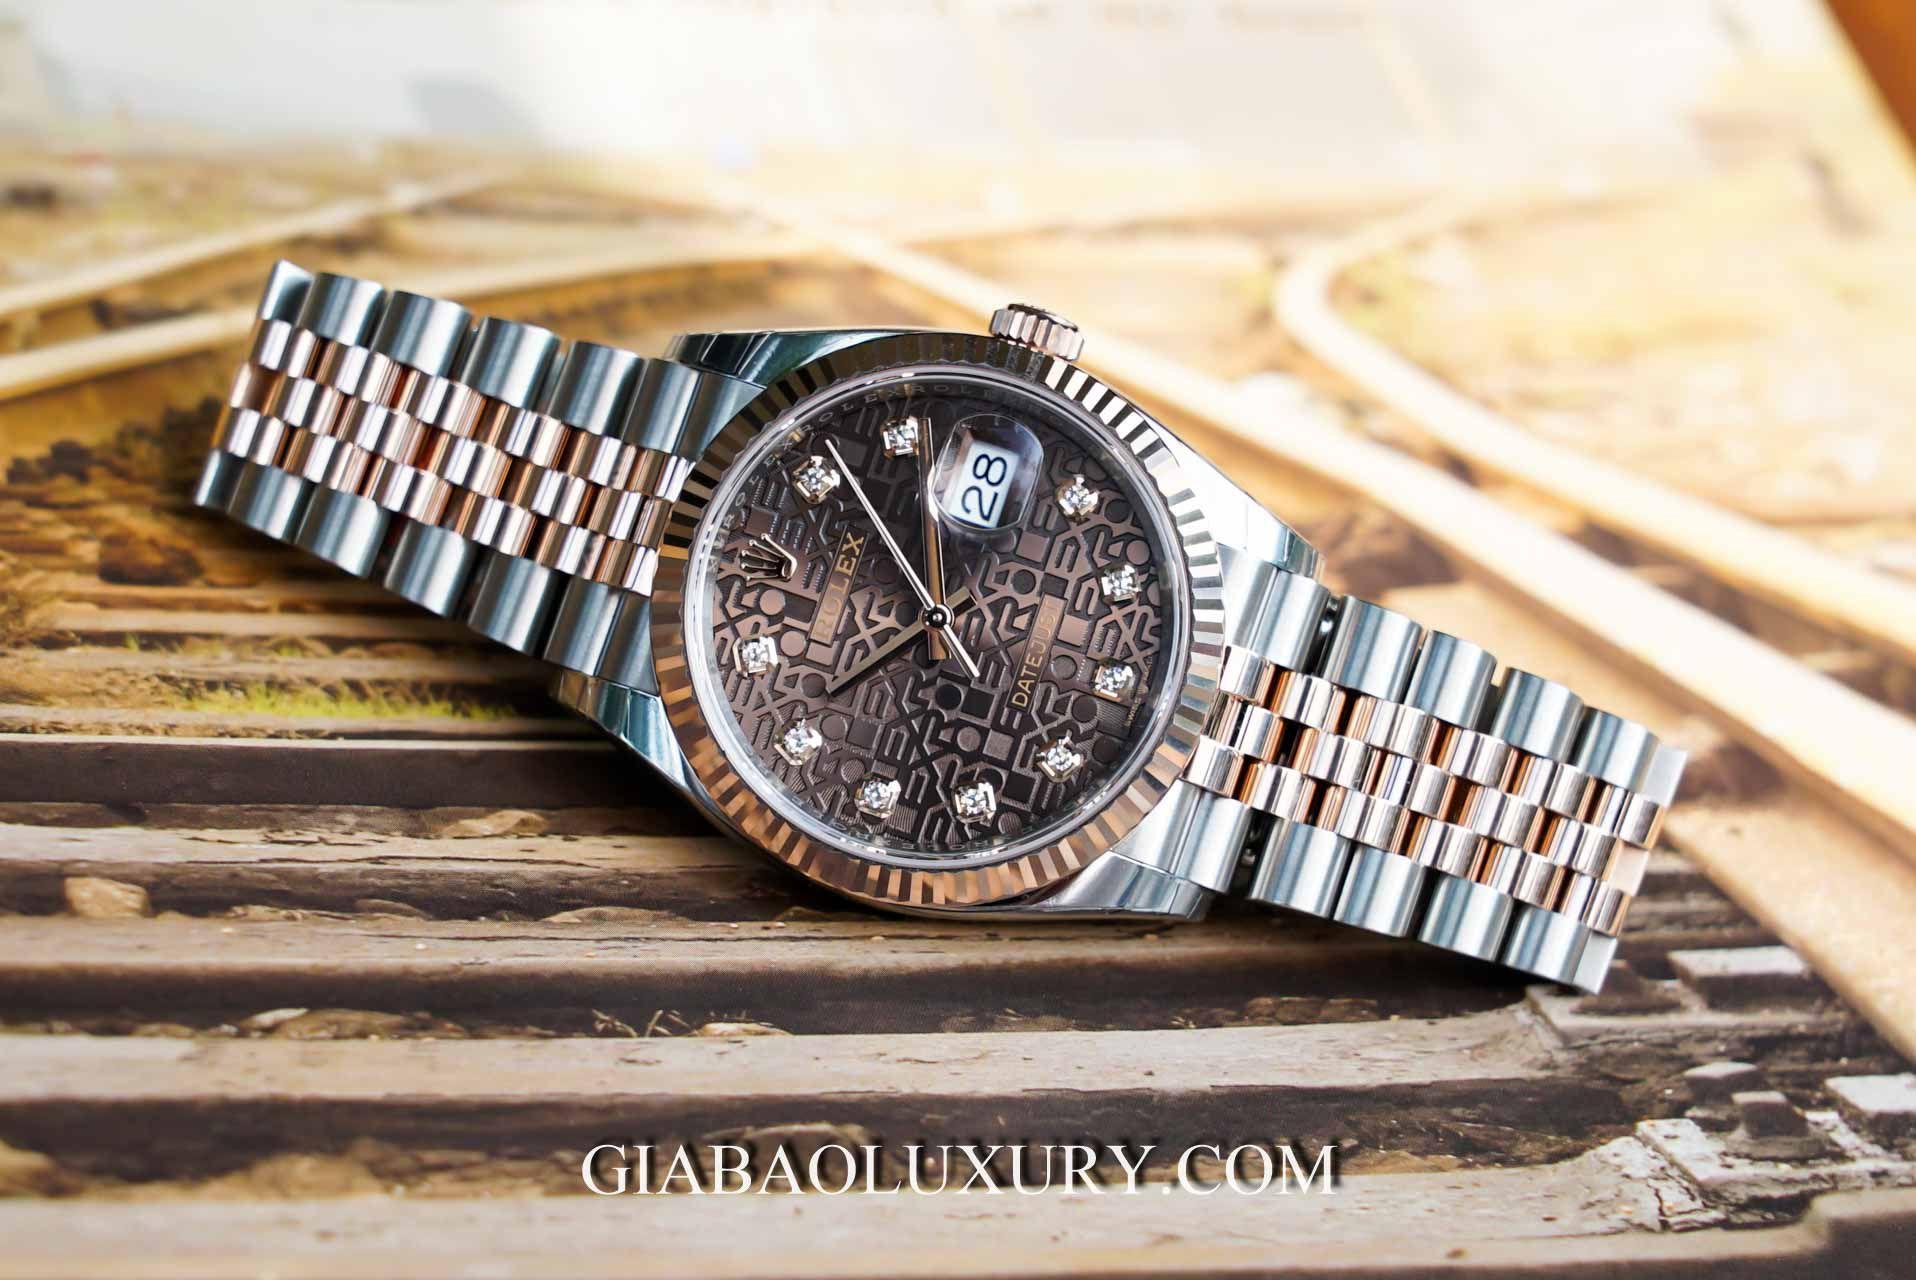 Đồng hồ Rolex Datejust 36 126231 Mặt Số Vi Tính Chocolate